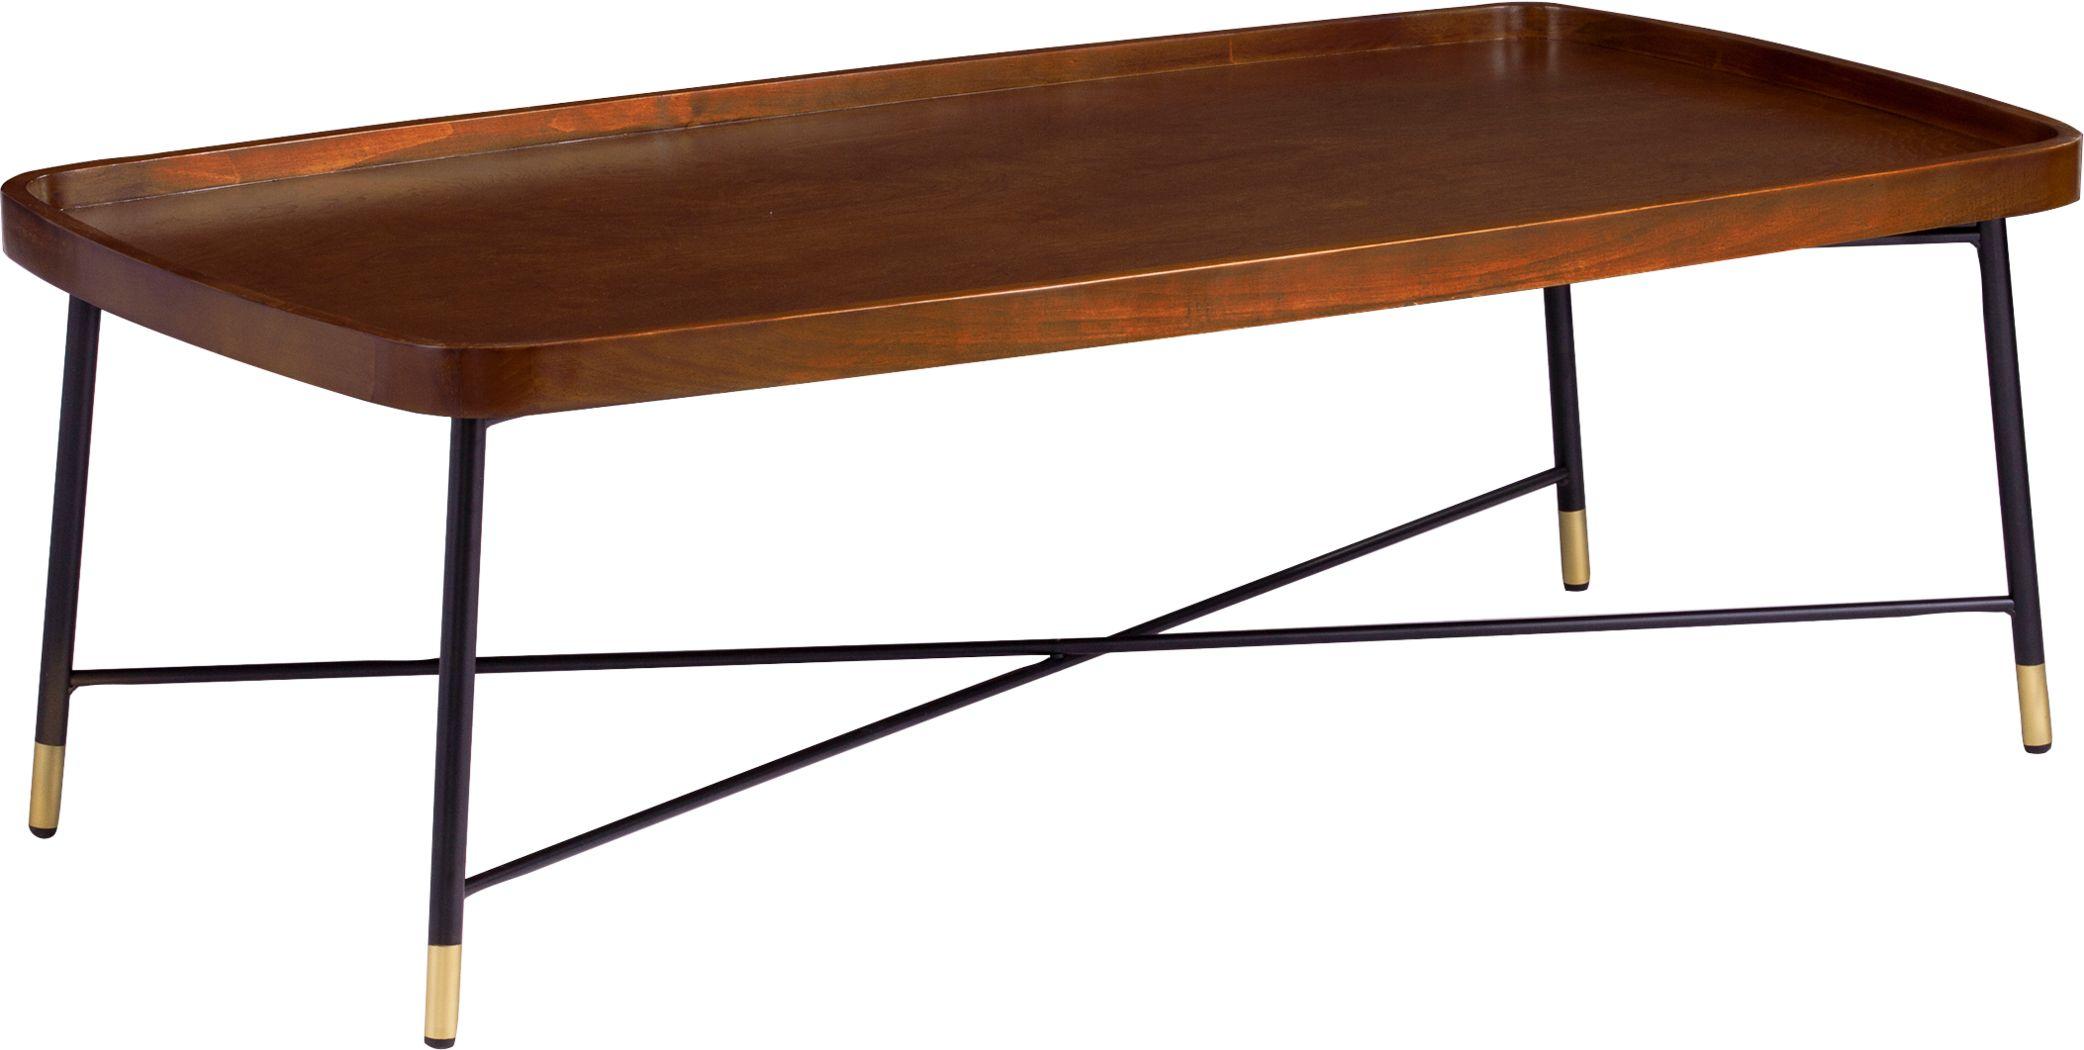 Flicker Court Walnut Cocktail Table